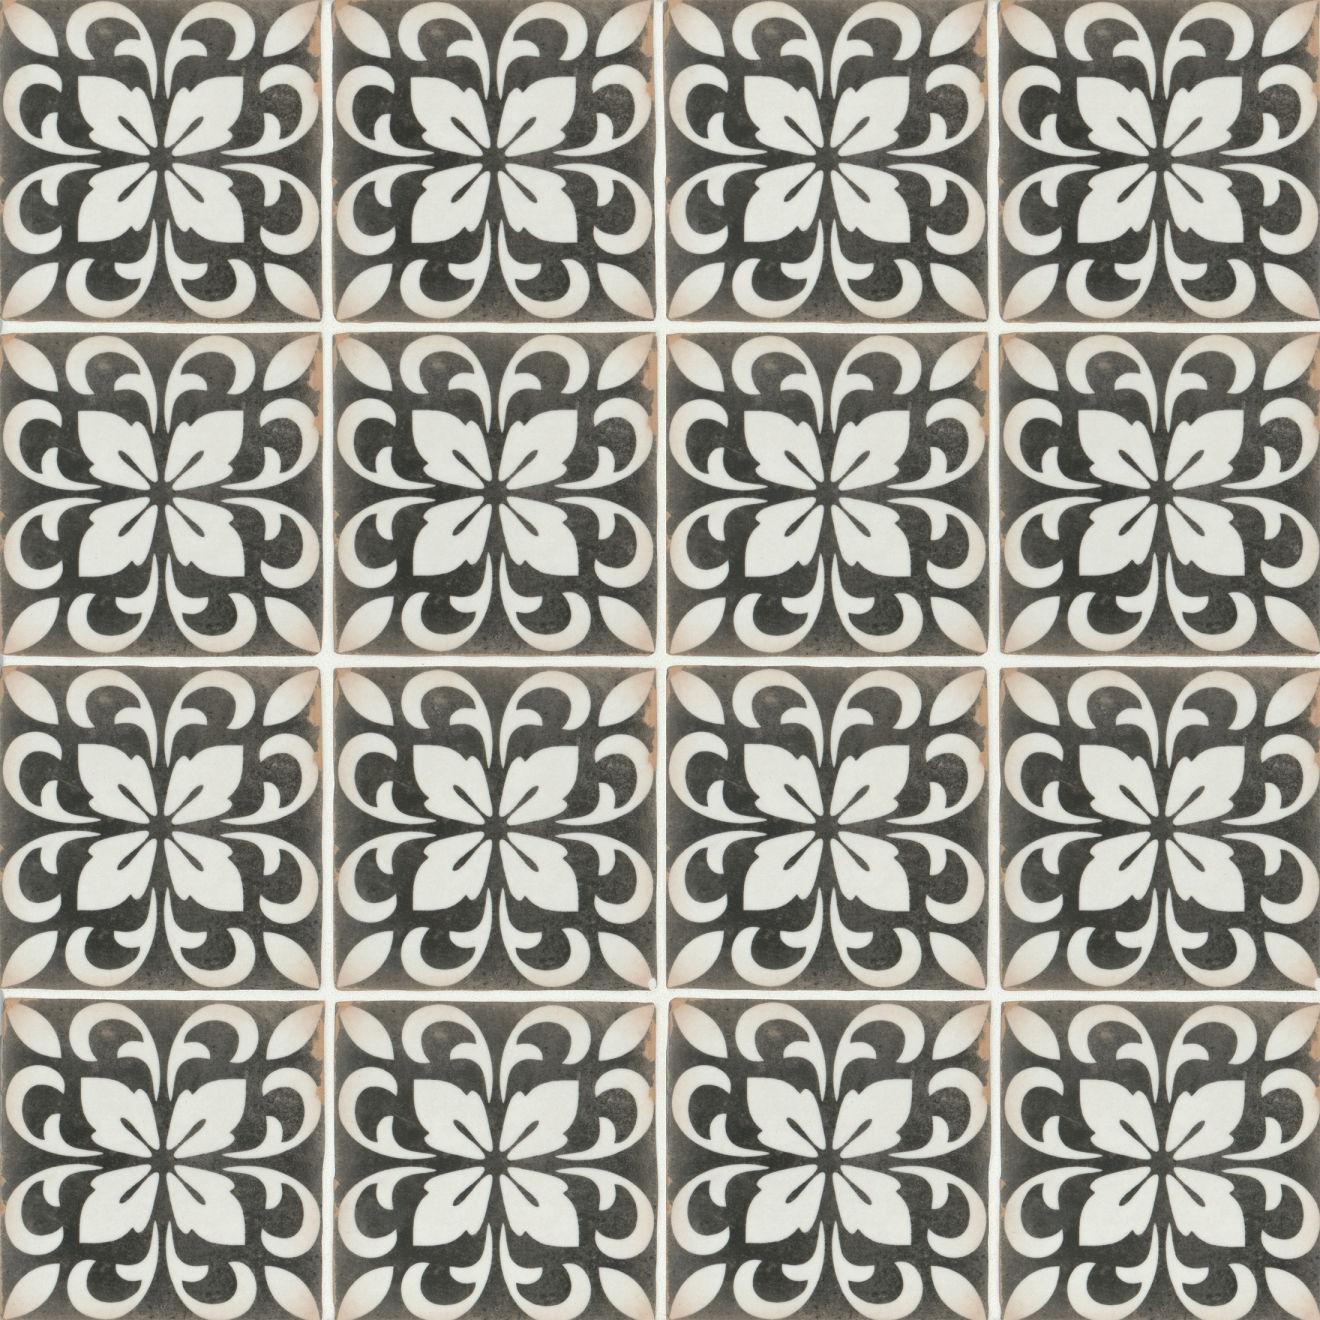 "Casablanca 5"" x 5"" Matte Ceramic Floor and Wall Tile in Rialto"